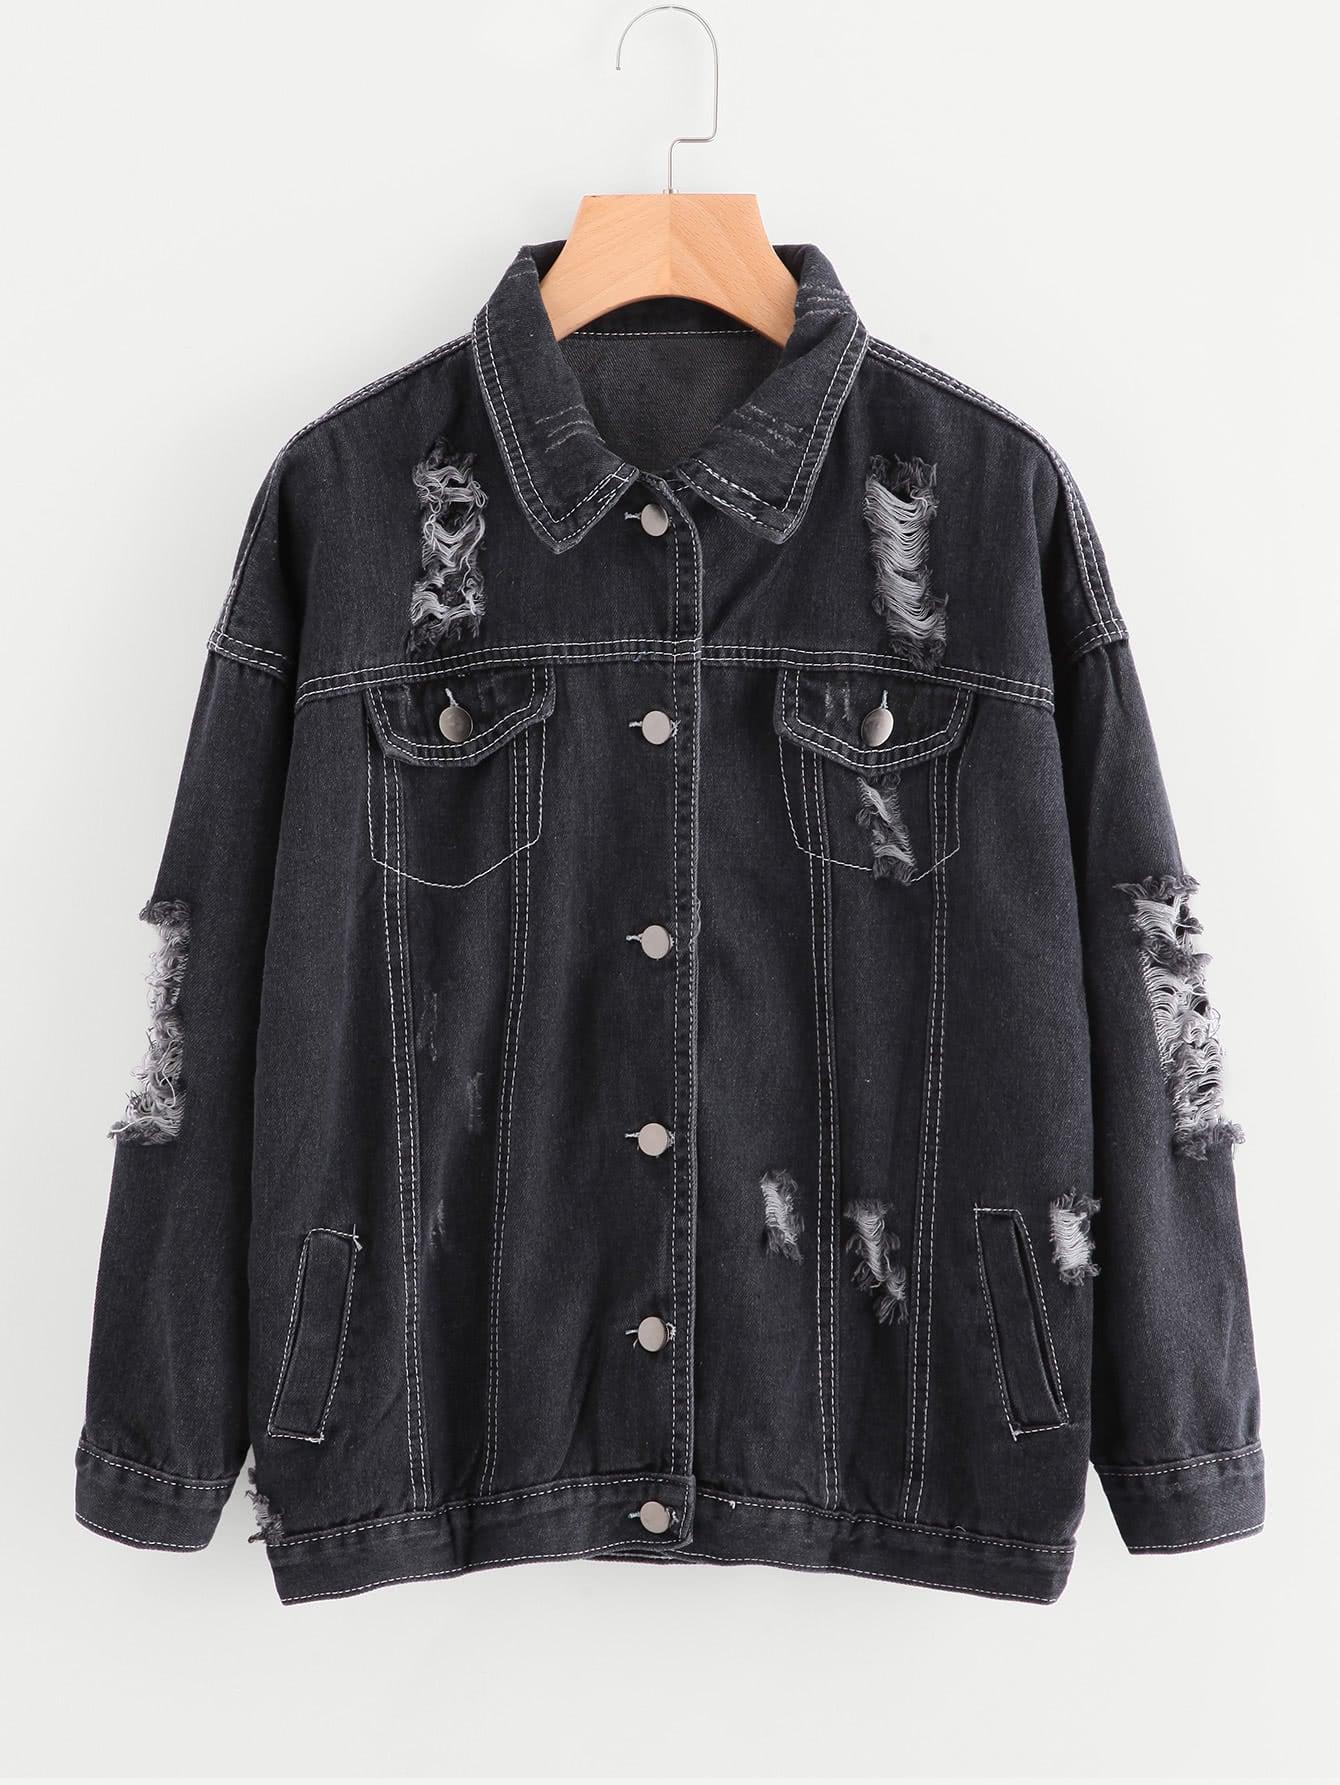 Ripped Stitch Detail Denim Jacket